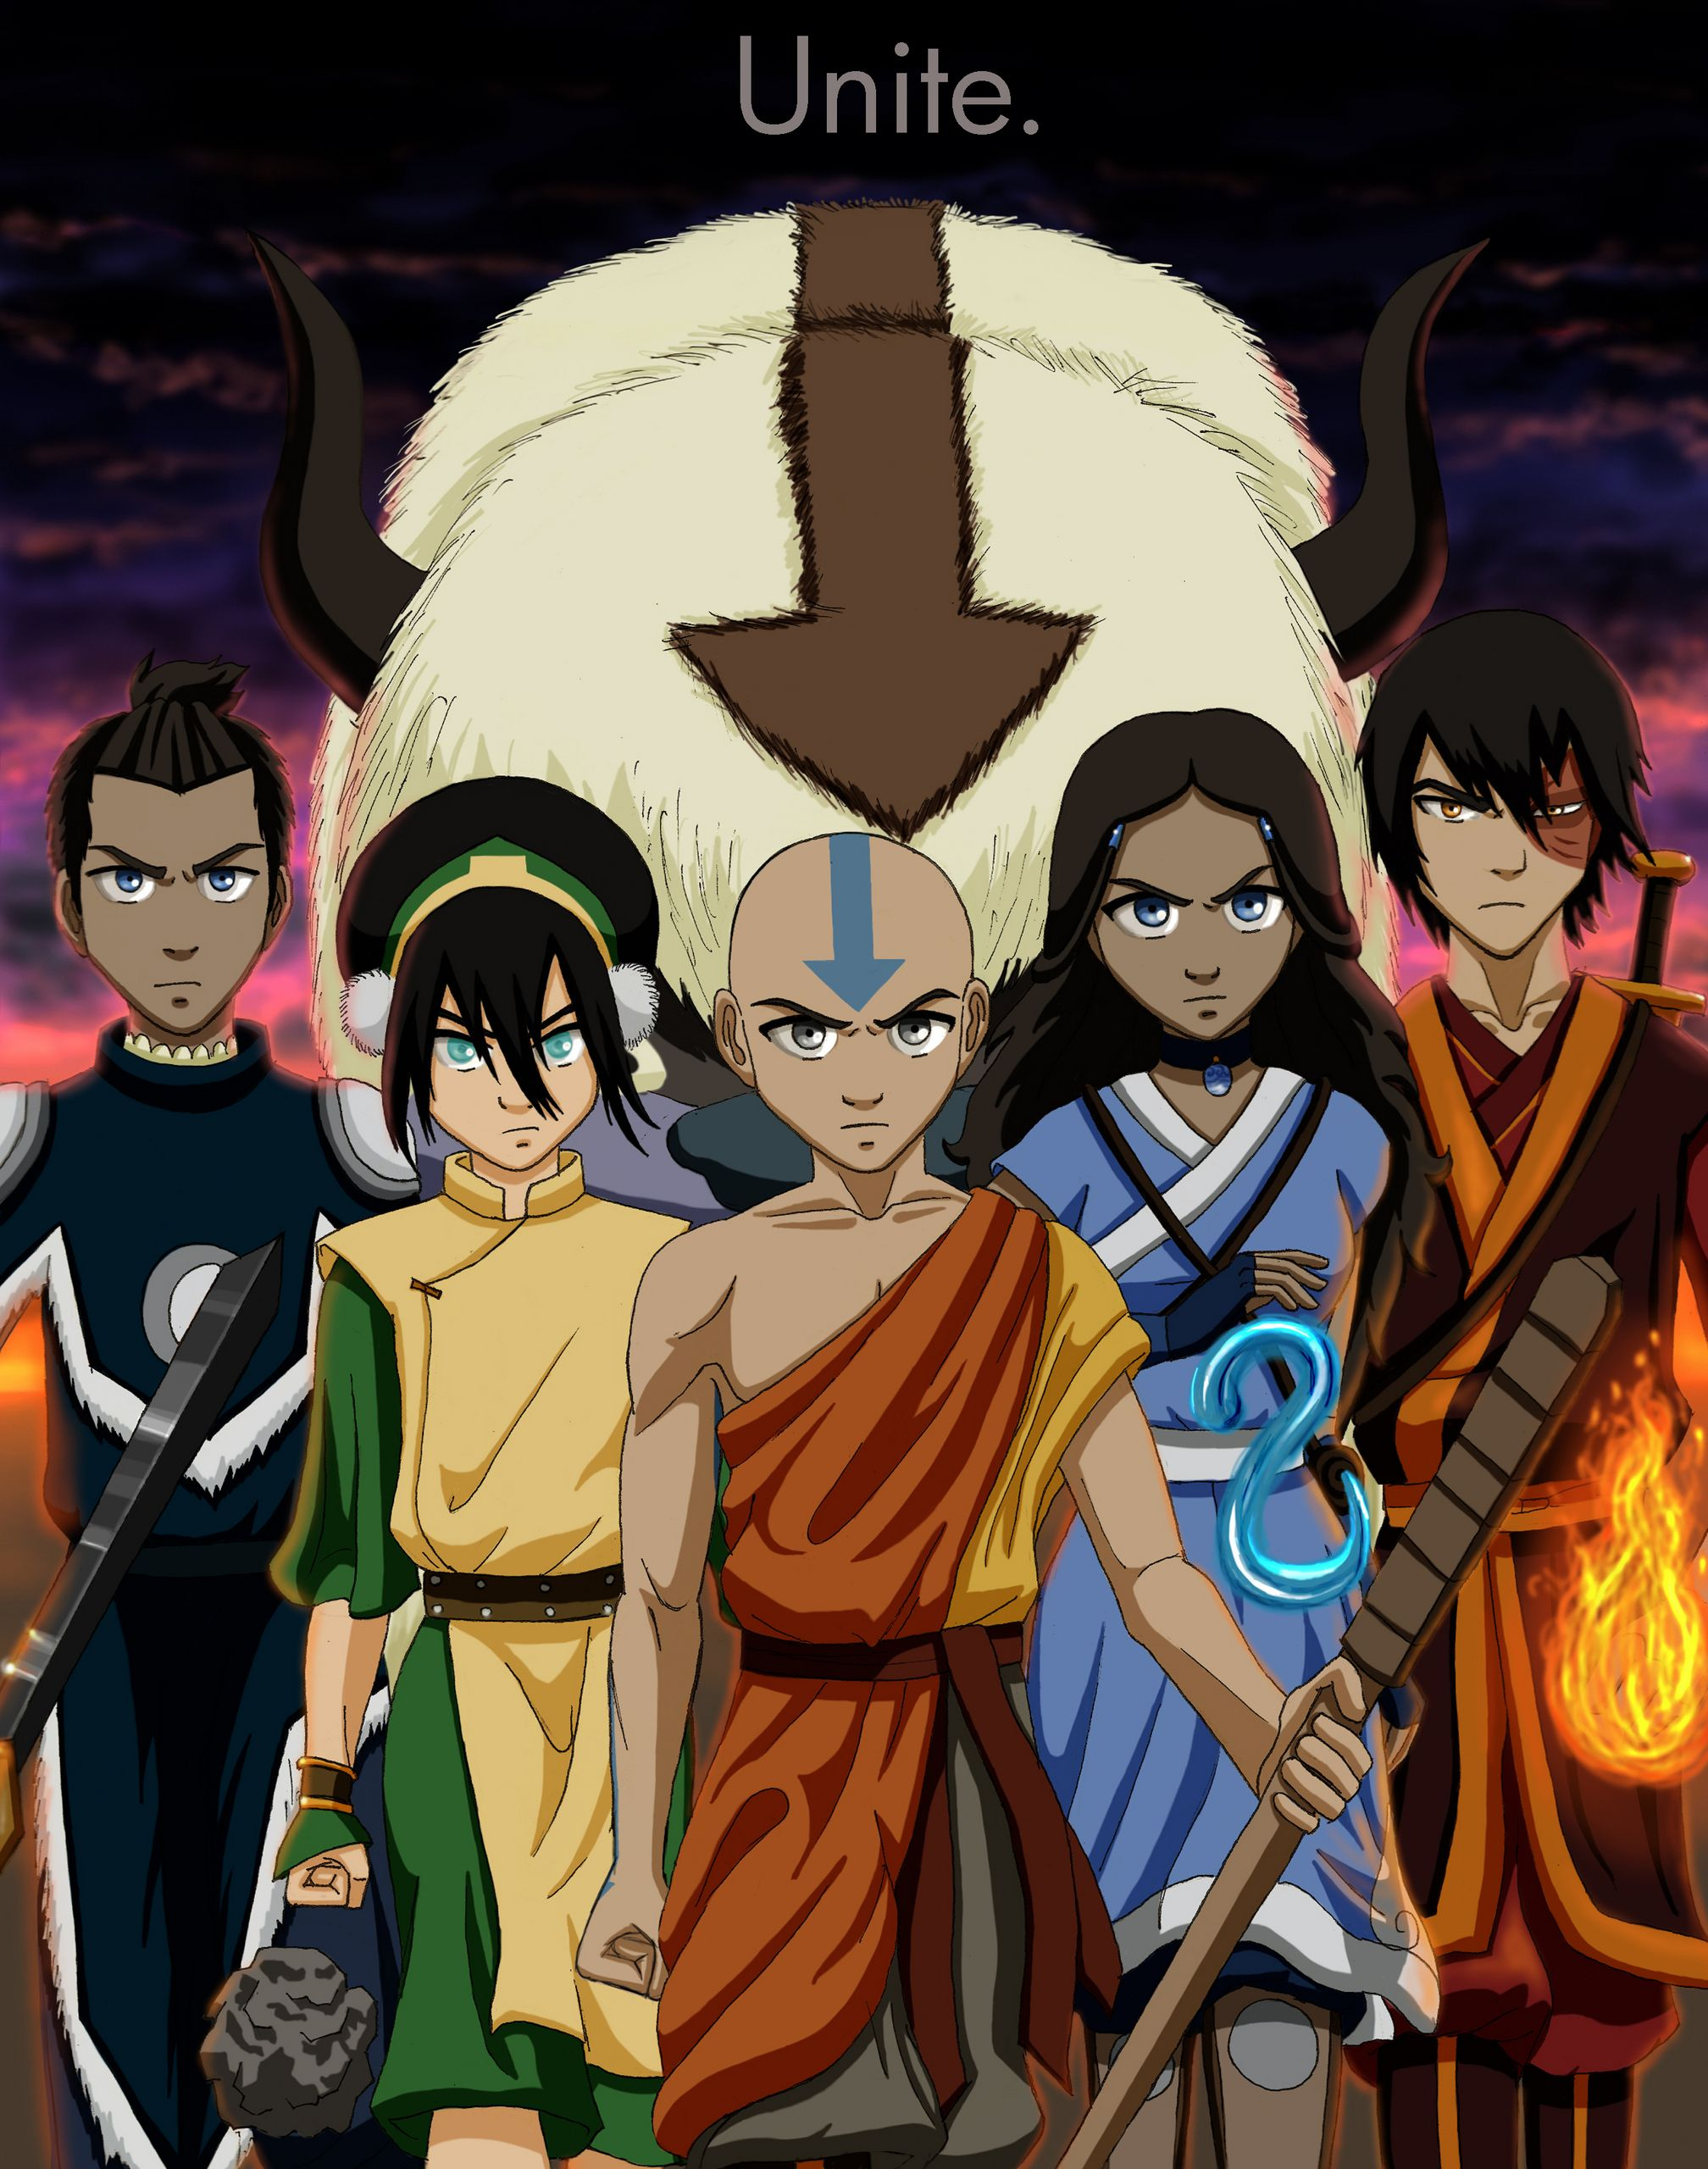 The Gaang (Sokka, Toph, Aang, Katara, Zuko) Avatar The